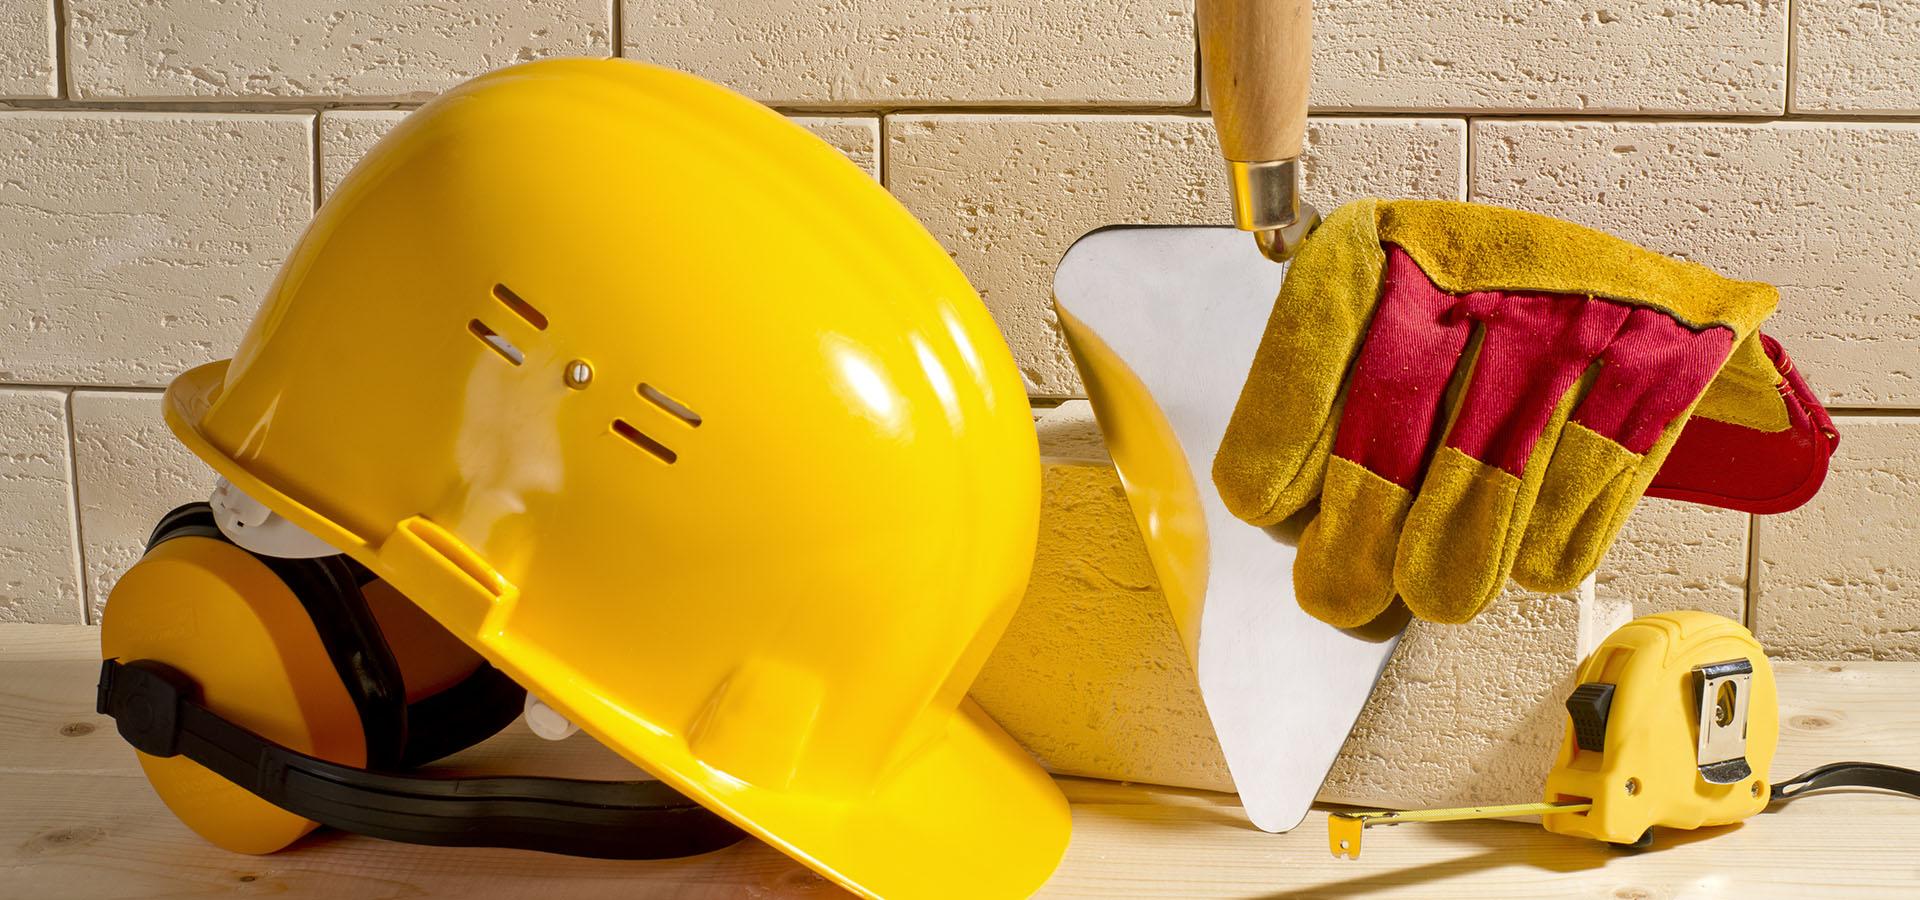 Builders Hand Tools